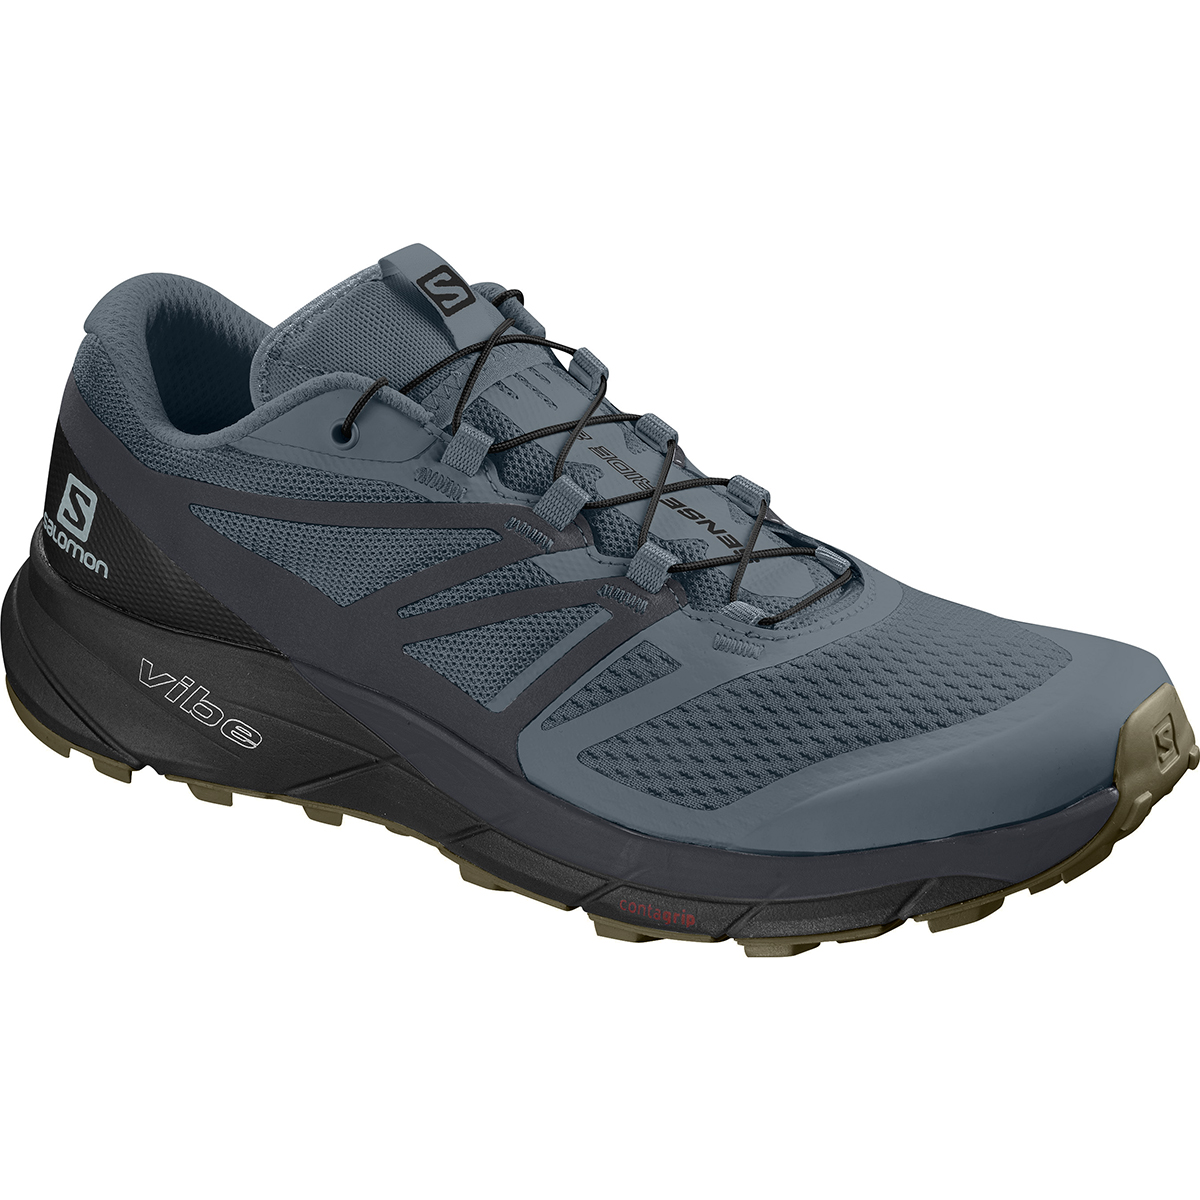 Salomon Men's Sense Ride 2 Trail Running Shoes - Black, 13